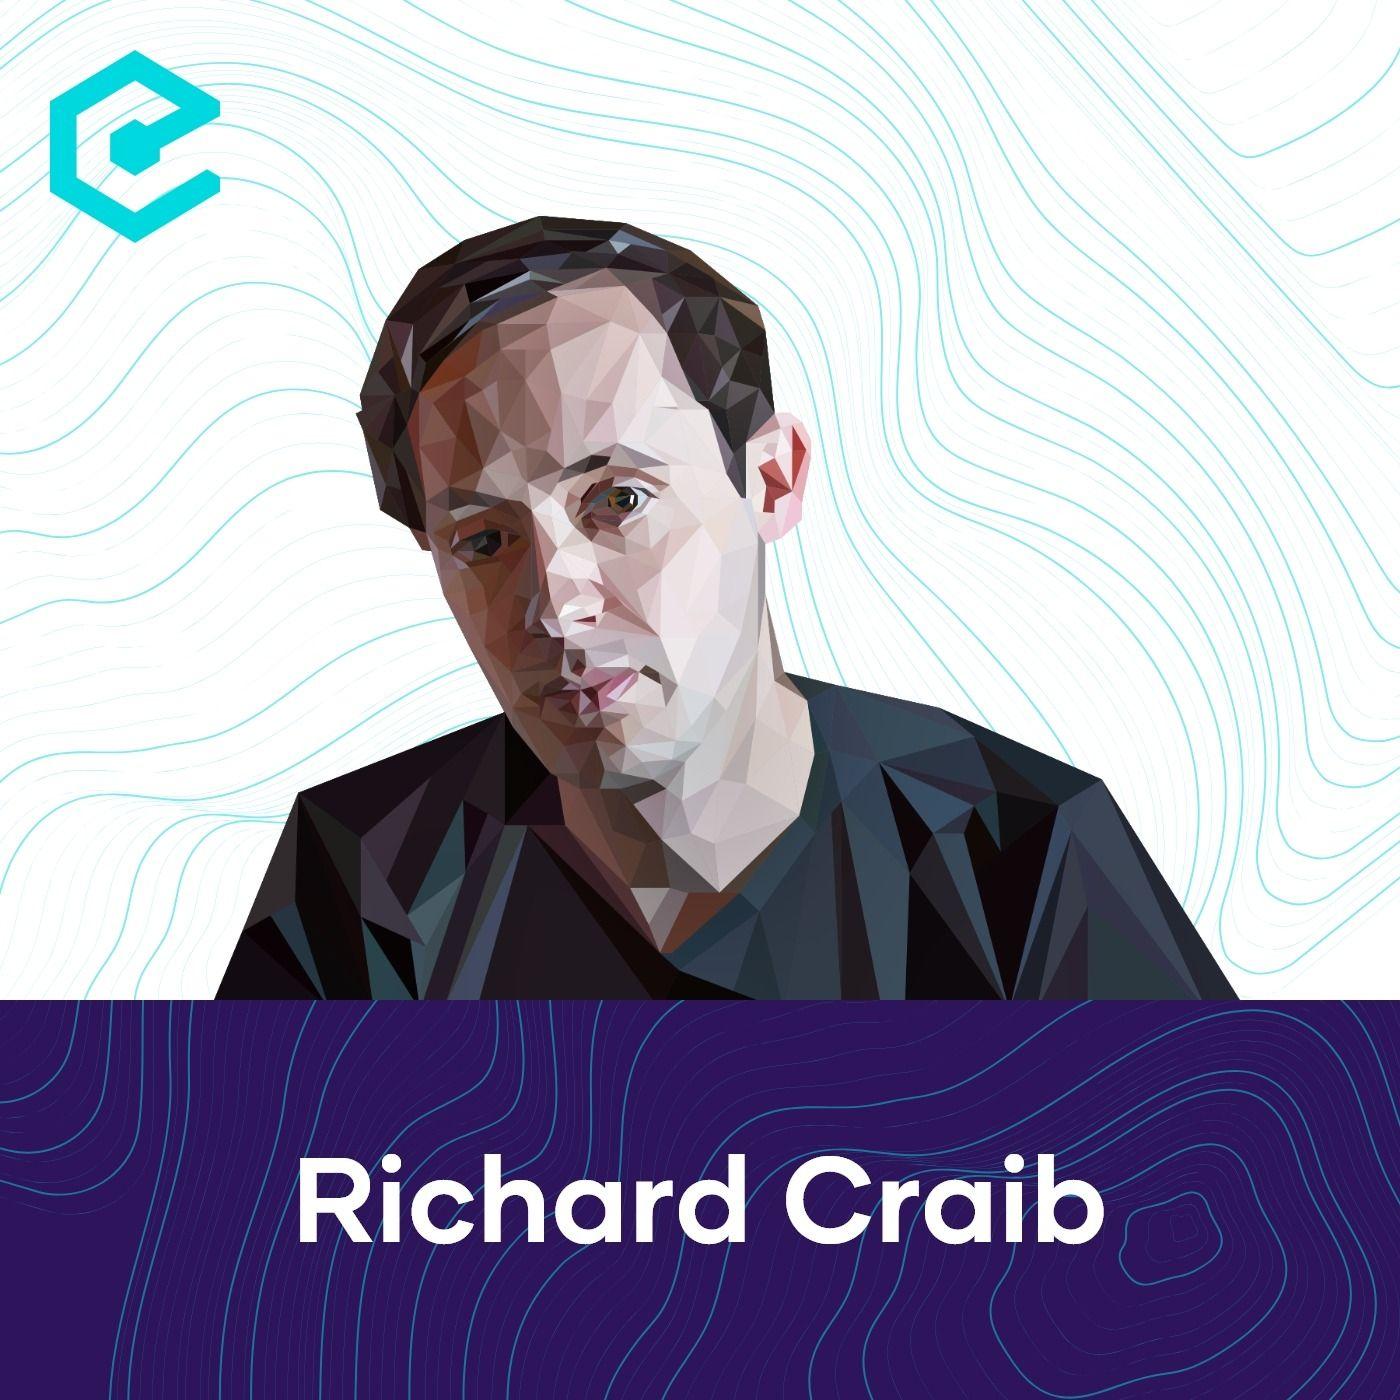 Richard Craib: Numerai – The Crowdsourced Predictive Model Hedge Fund